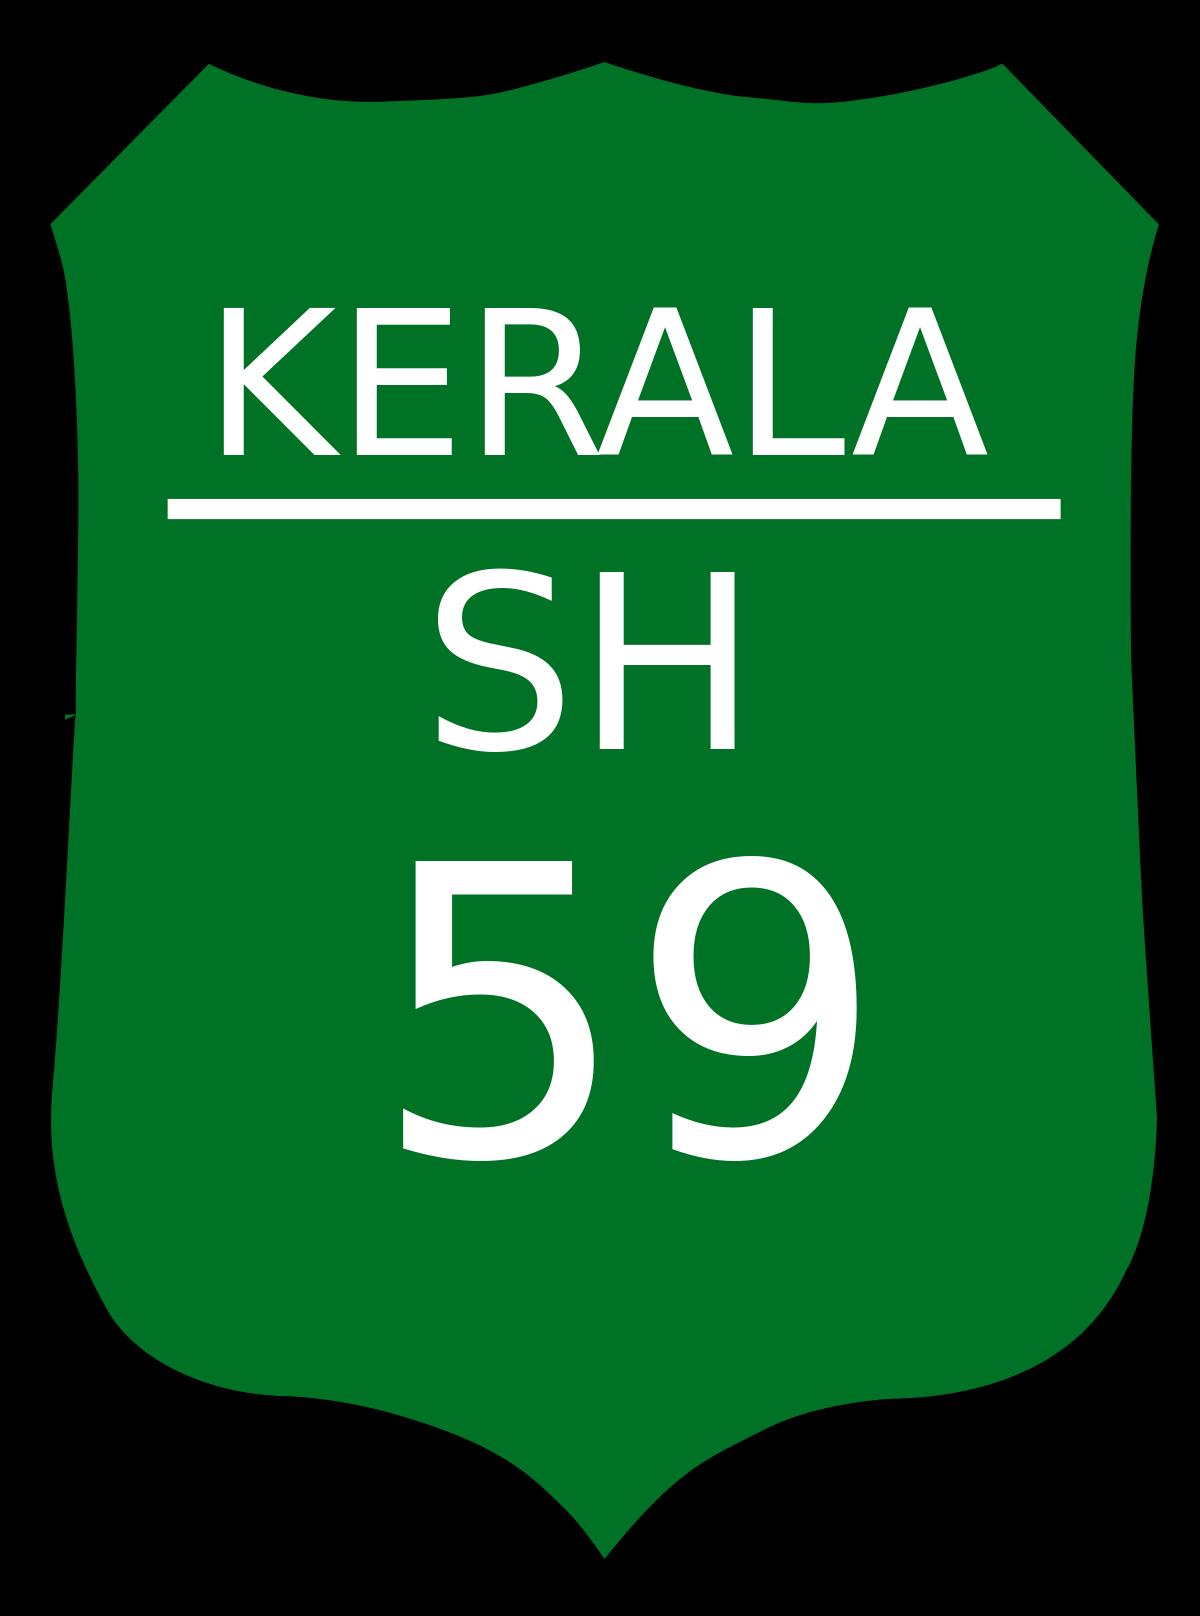 Hill highway kerala wikipedia. Location clipart road network